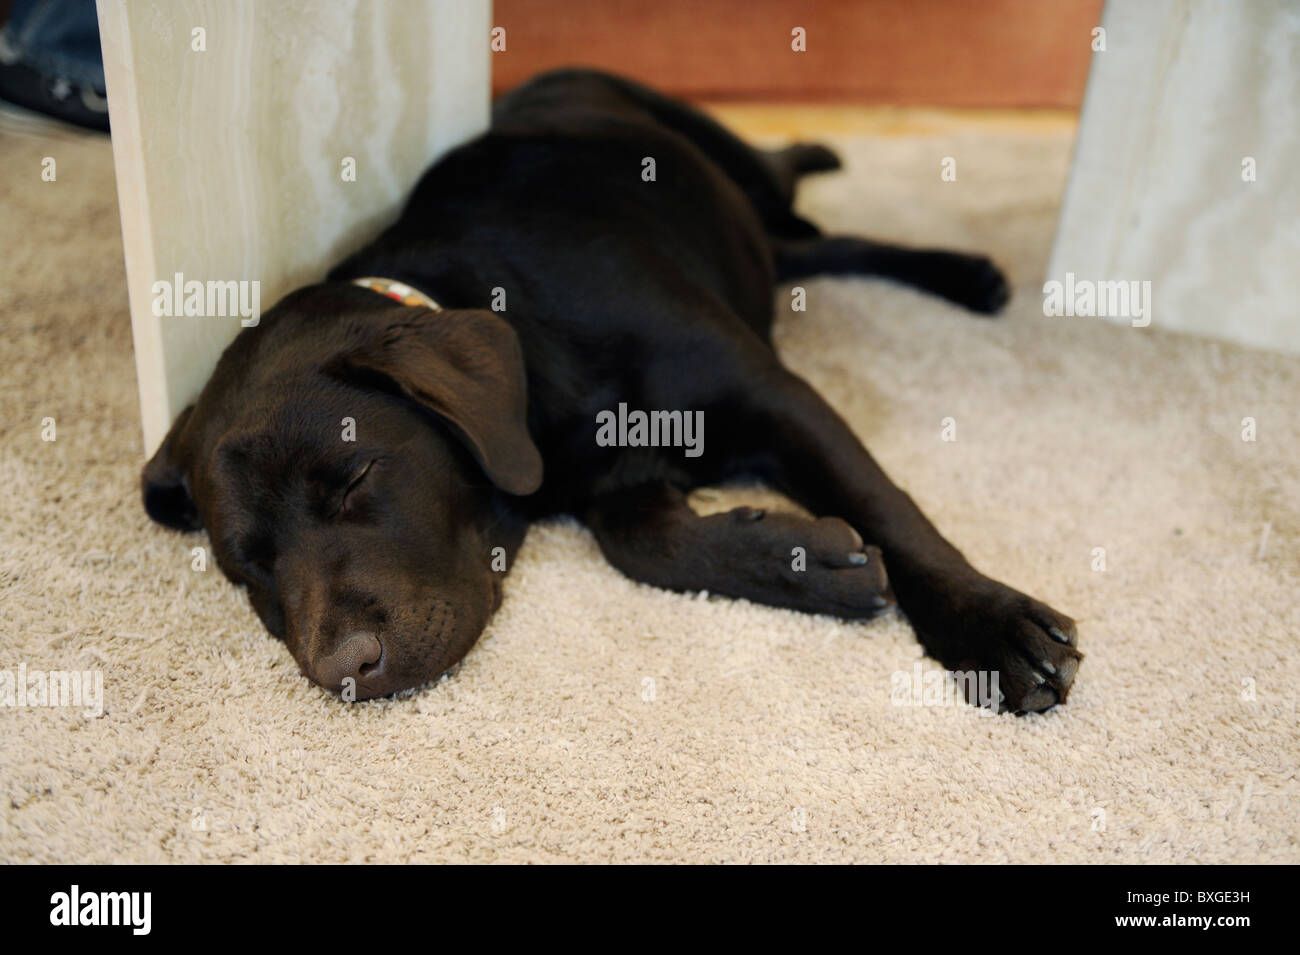 Chocolate Brown Labrador puppy dog sleeping on carpet - Stock Image